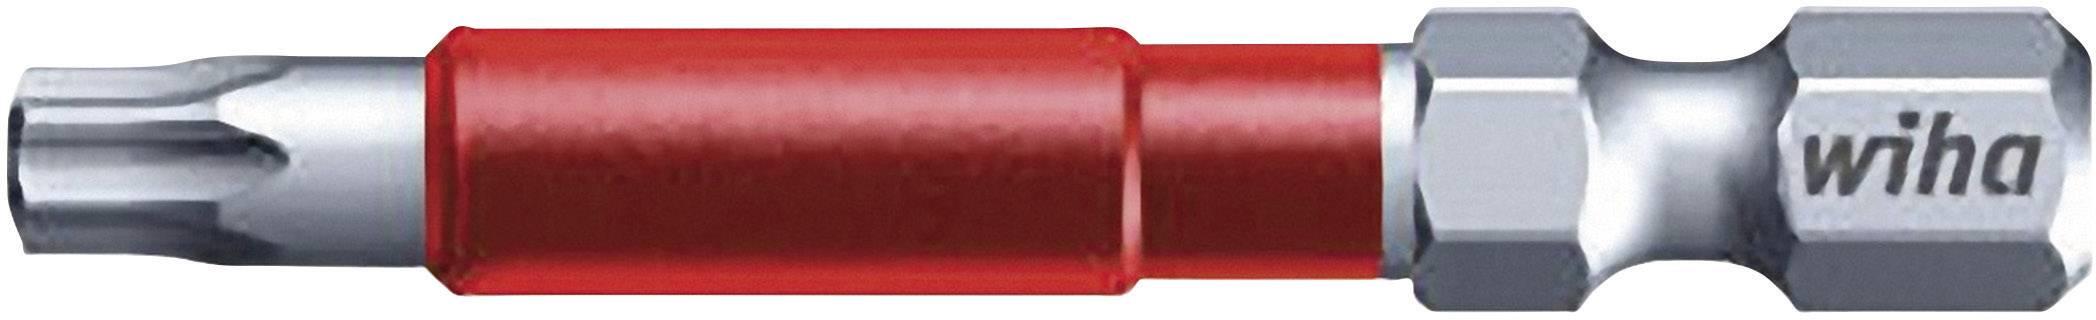 Bit Torx Wiha MaxxTor 7045 M9T 36840, 49 mm, nástrojová oceľ, legované, tvrdené, 5 ks